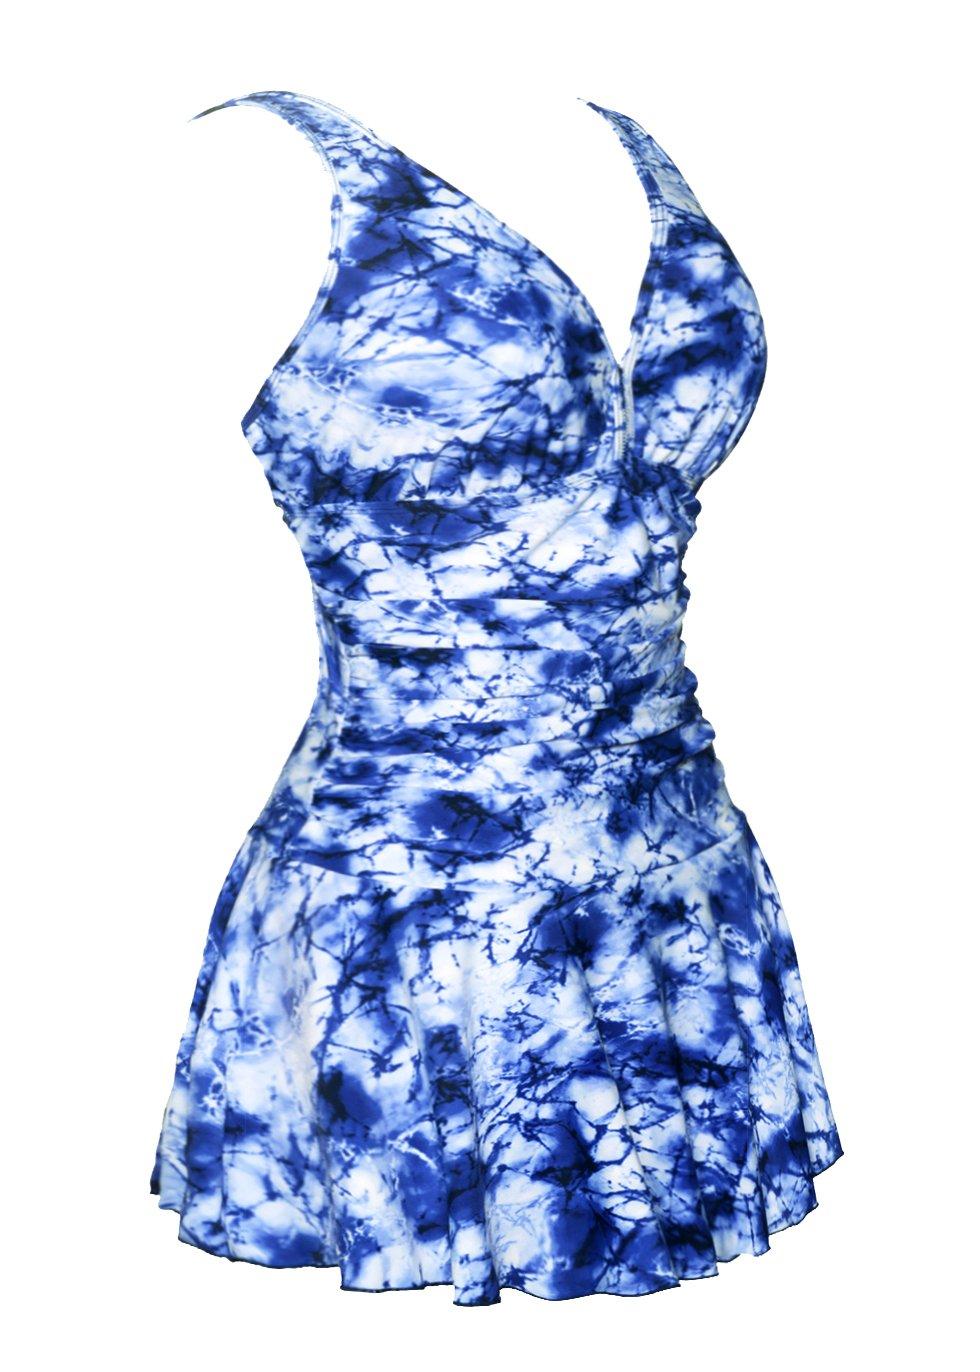 COCOPEARレディース ワンピース水着 ボディシェイプ プリント入り スカート付き プラスサイズ B01H3EHJL8 Large / 14-16|Leopard Floral